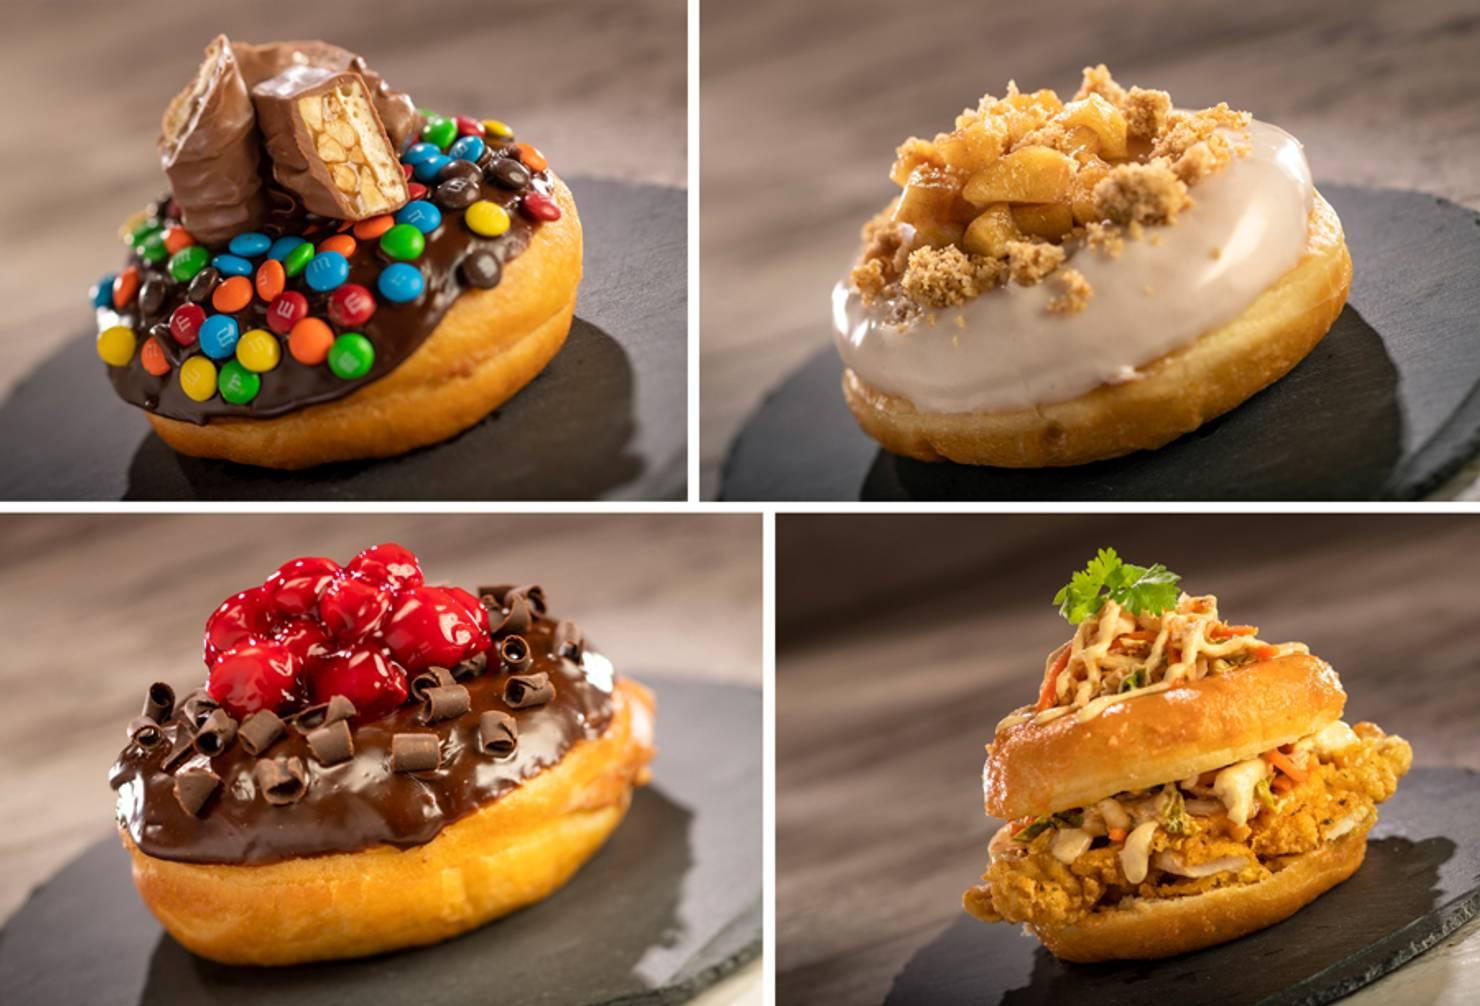 The Donut Box - Candy Jar Donut, Sriracha-glazed Donut, Chef's Donut of the Day and  Crispy Chicken on a Sriracha-glazed Donut